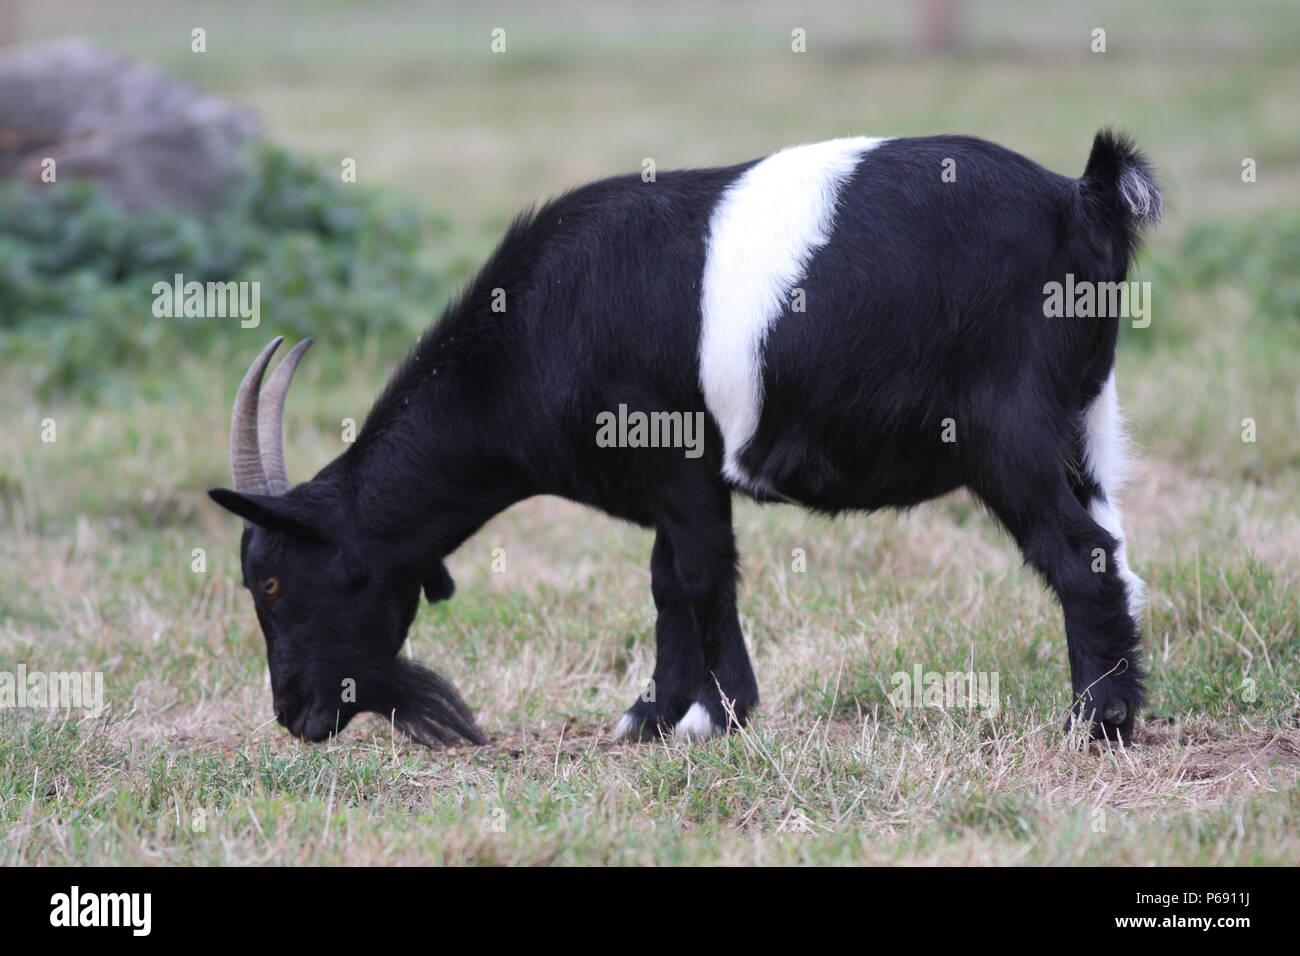 Black Male Goat Stock Photos & Black Male Goat Stock Images - Alamy